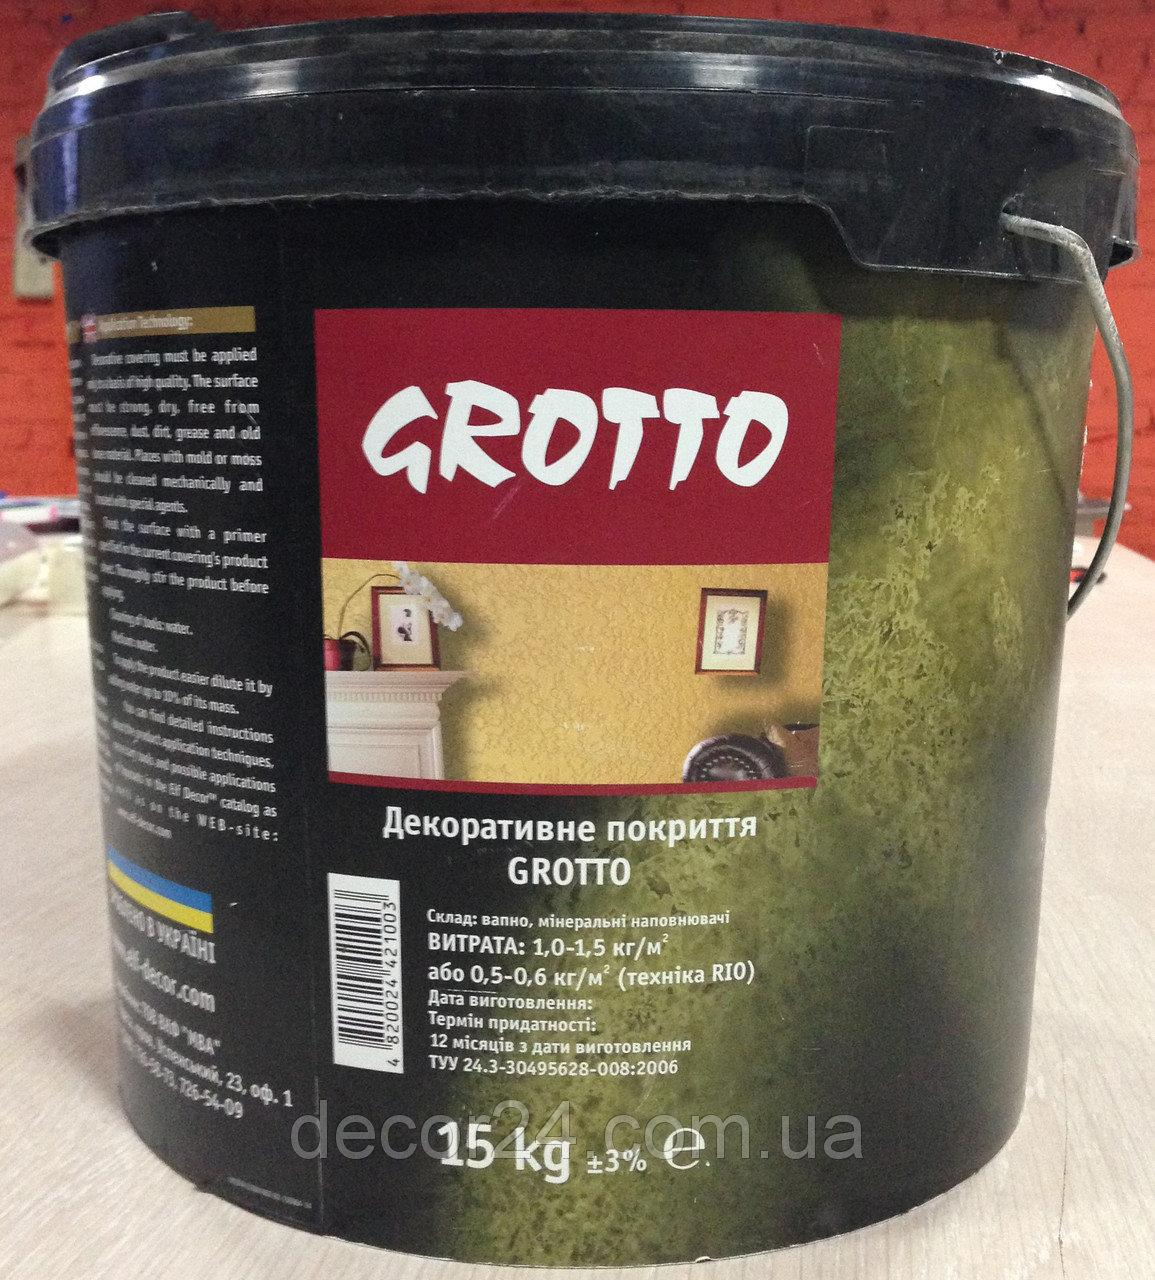 Grotto - декоративное покрытие эффект камня 15 кг